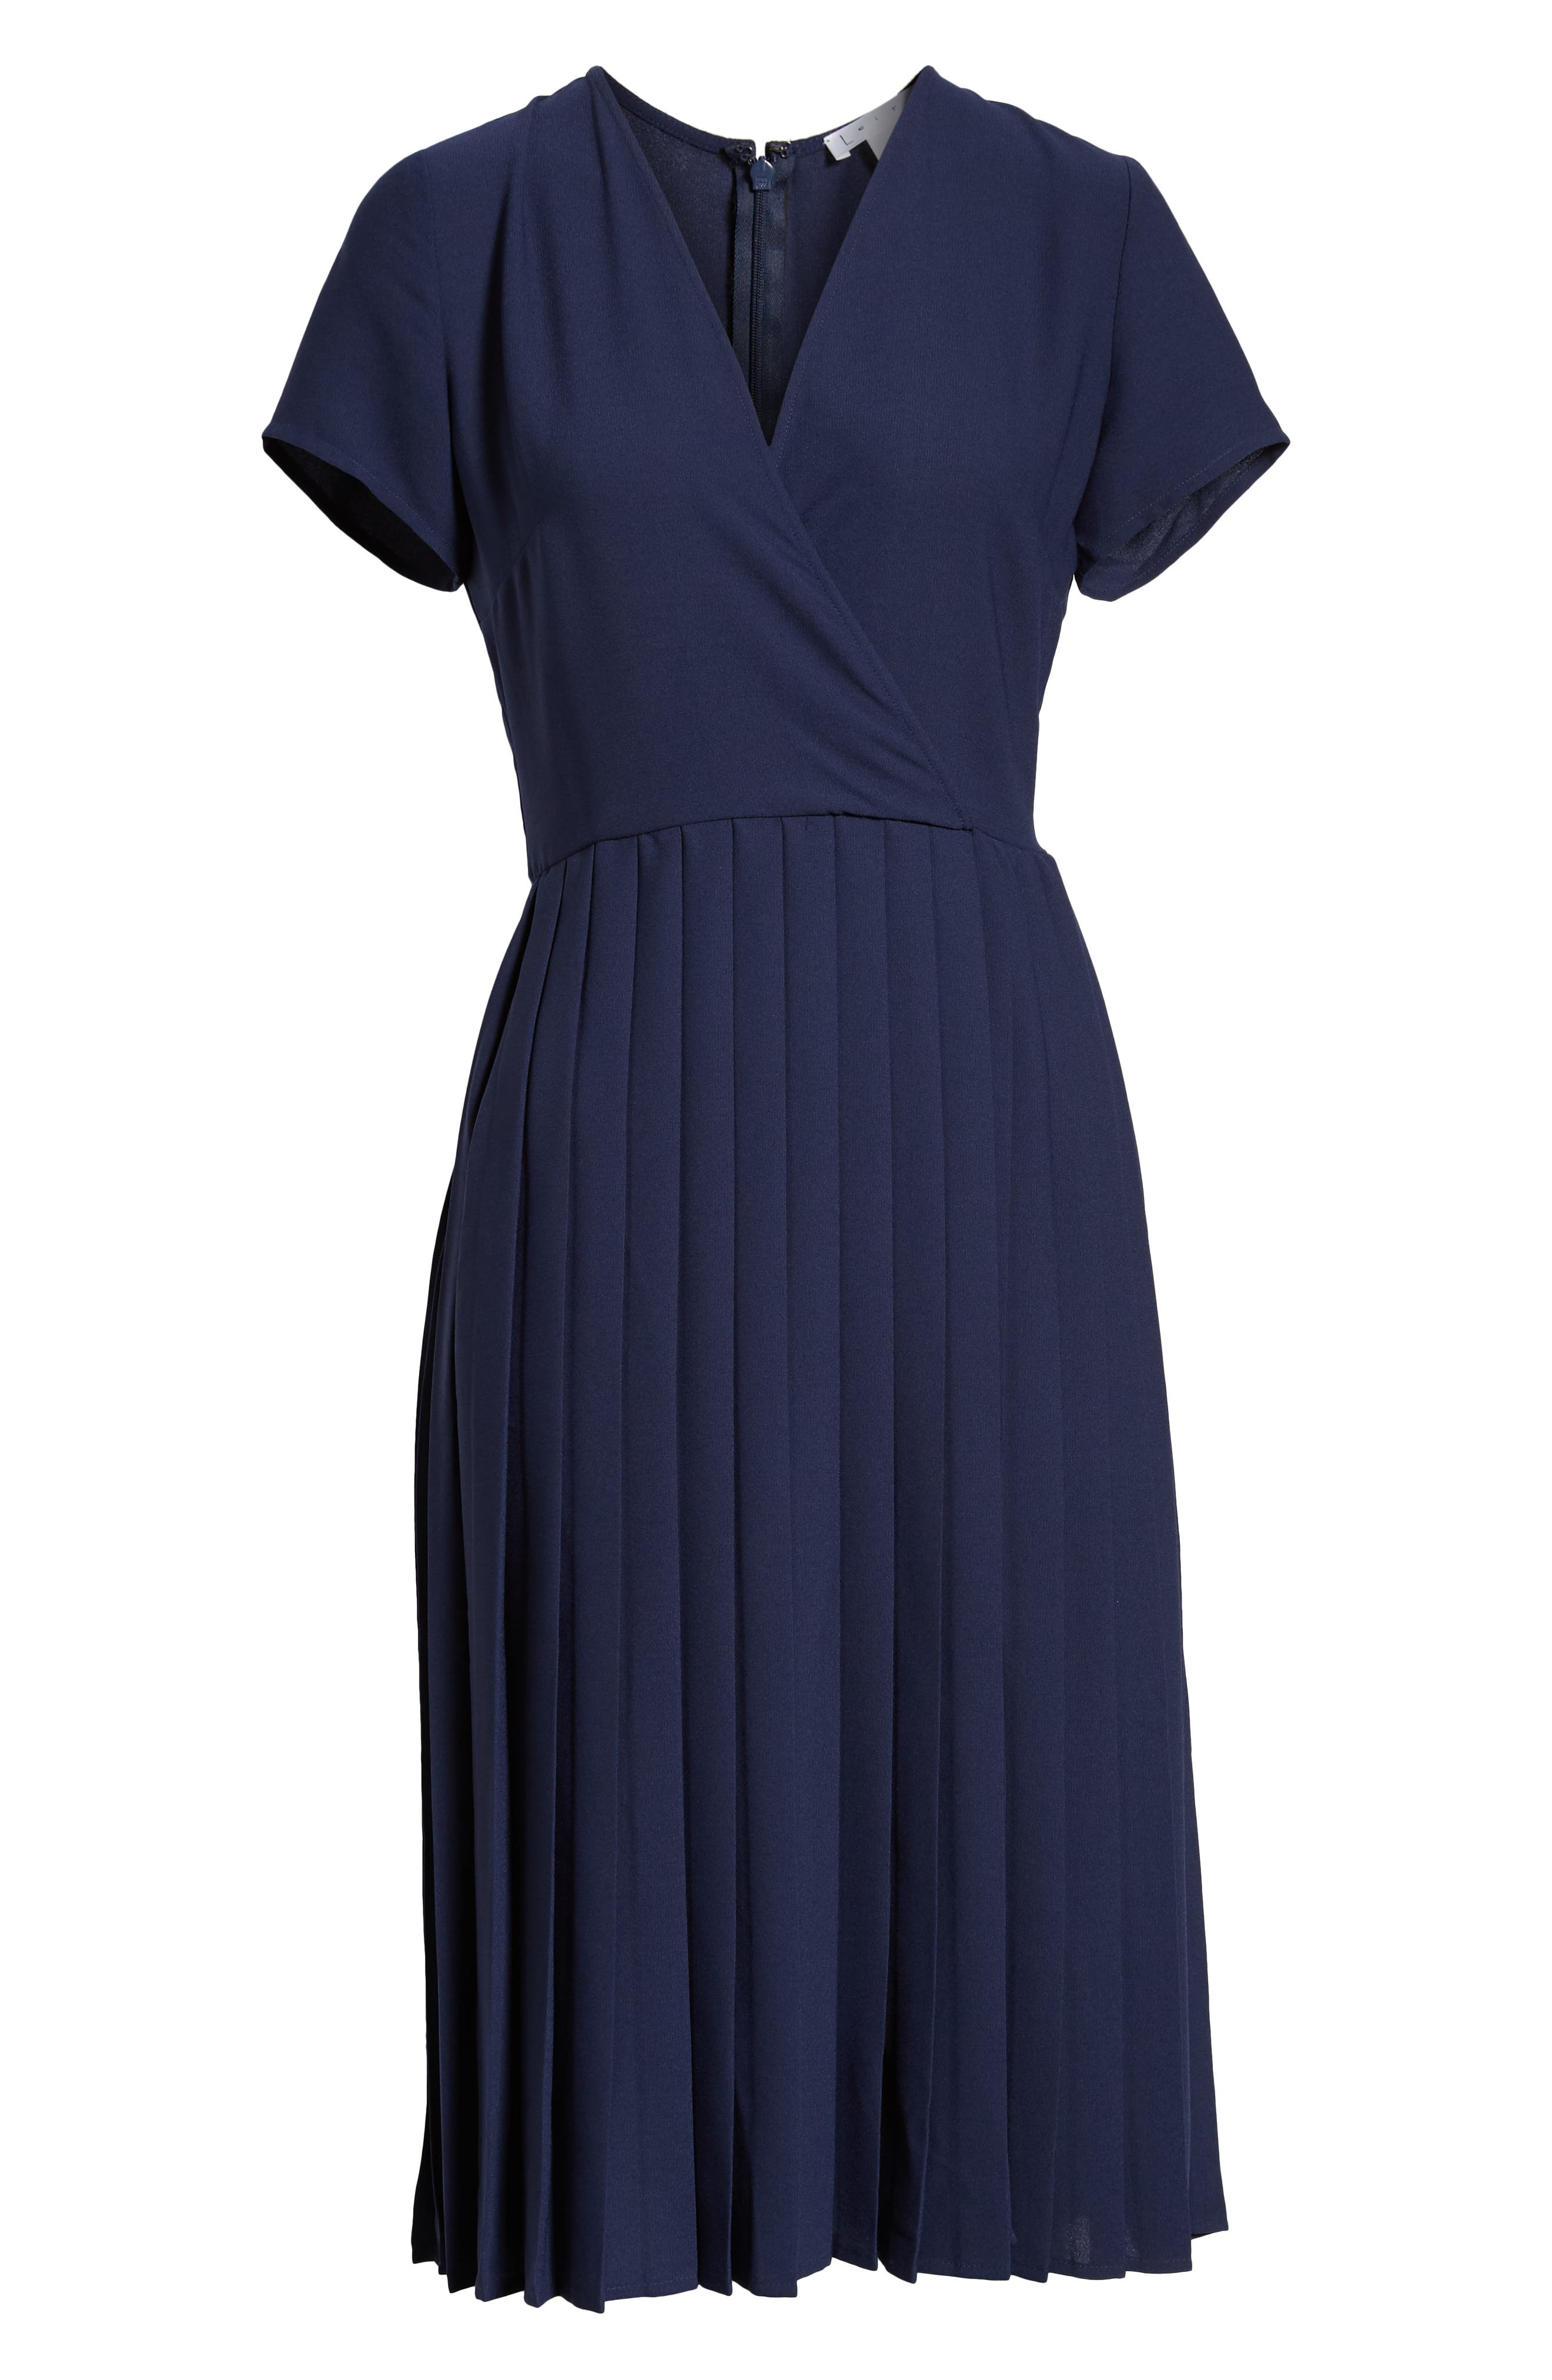 LEITH,                             Pleated Surplice Dress,                             Alternate thumbnail 8, color,                             NAVY PEACOAT